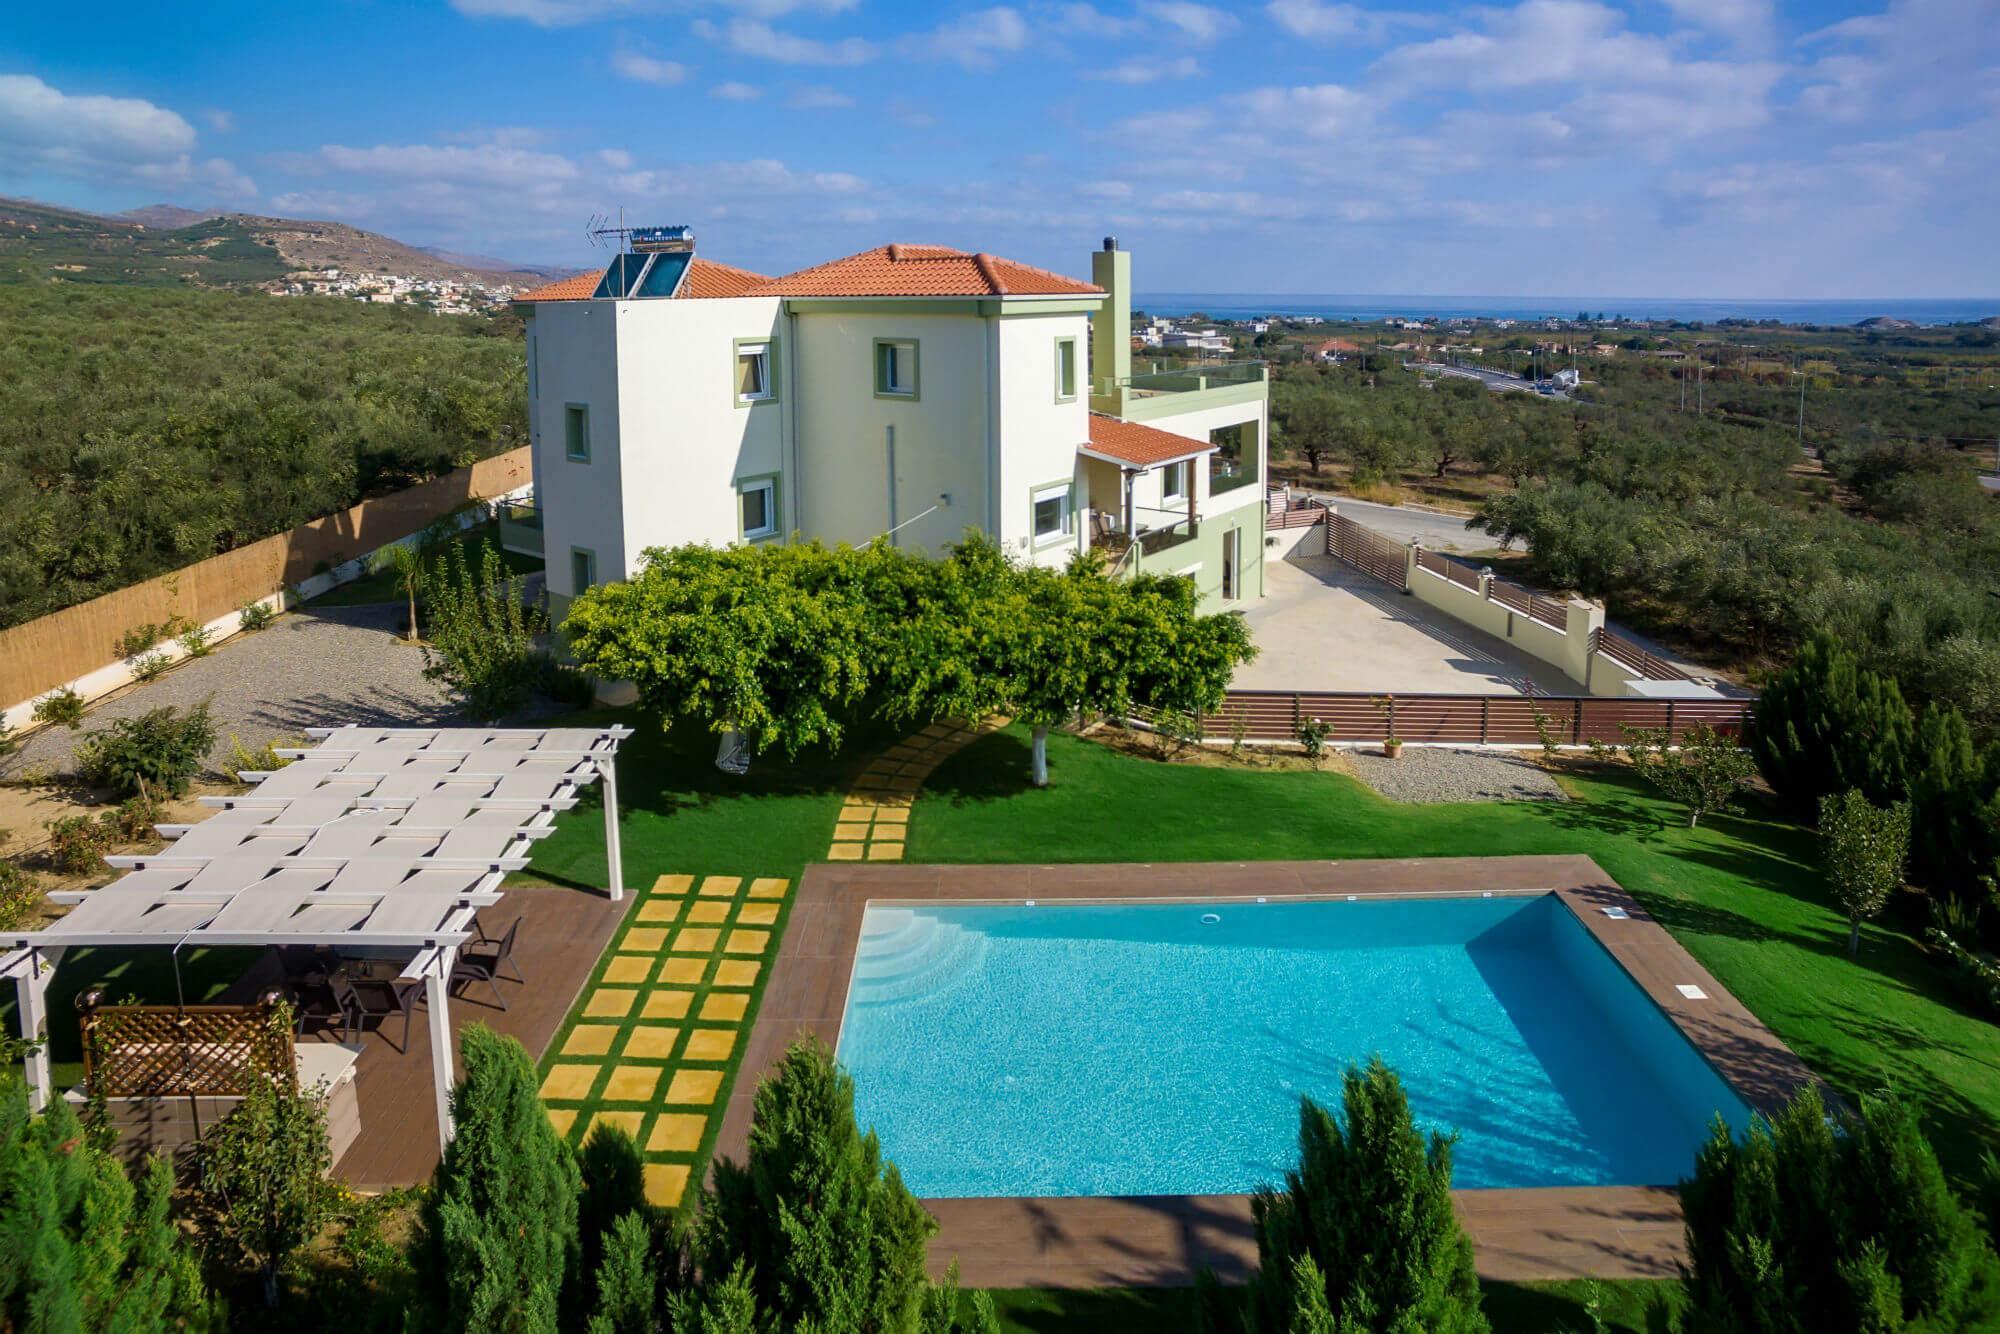 Villa Dimokratia   Enjoy Your Life